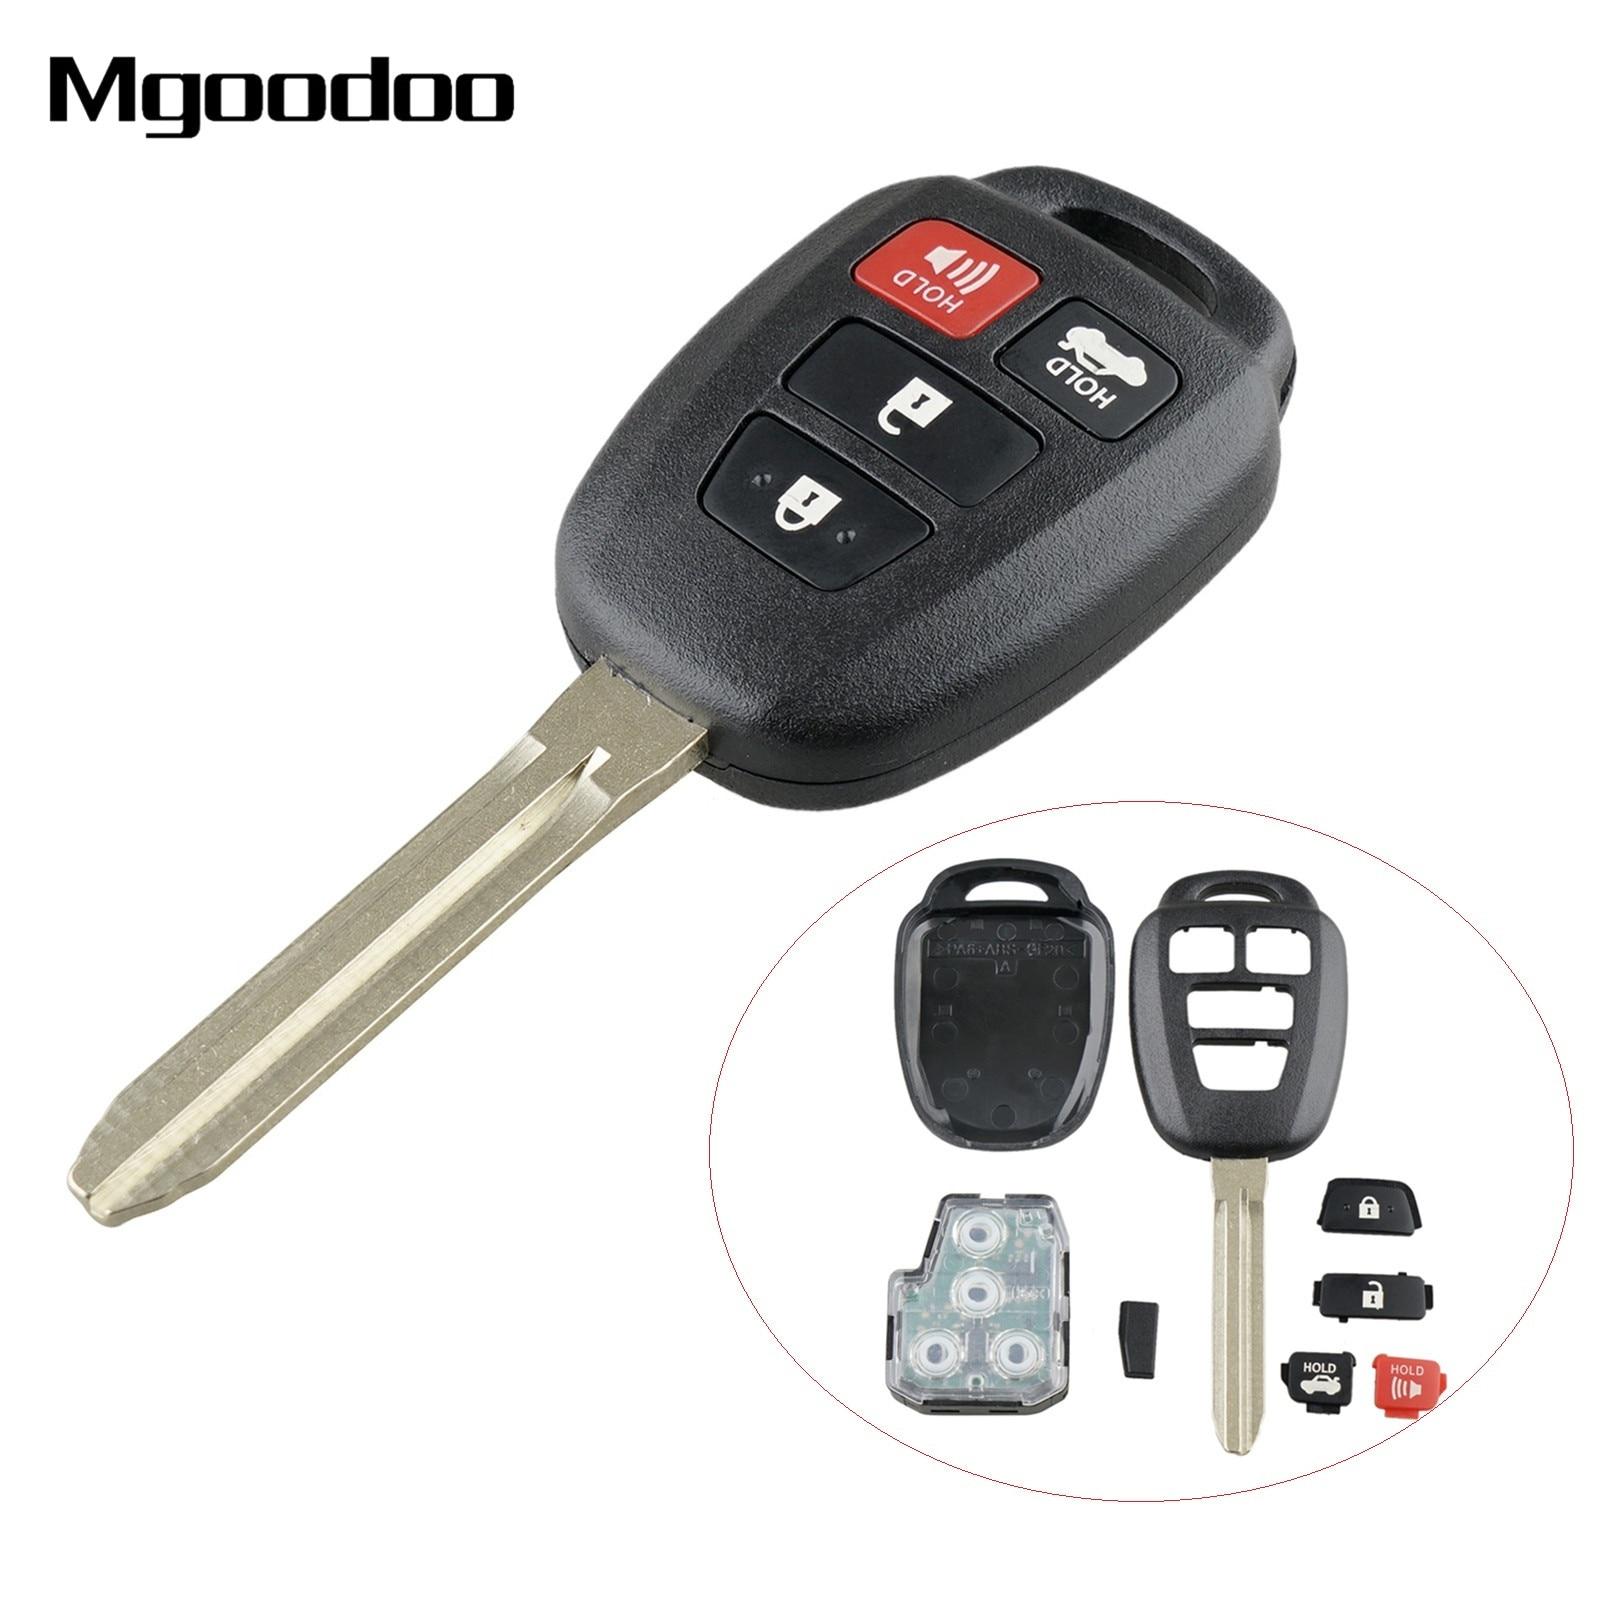 Mgoodoo 3 + 1 botón de mando a distancia de coche 315MHz para Toyota RAV4 Highlander W/ H Chip transpondedor FCCID GQ4-52T